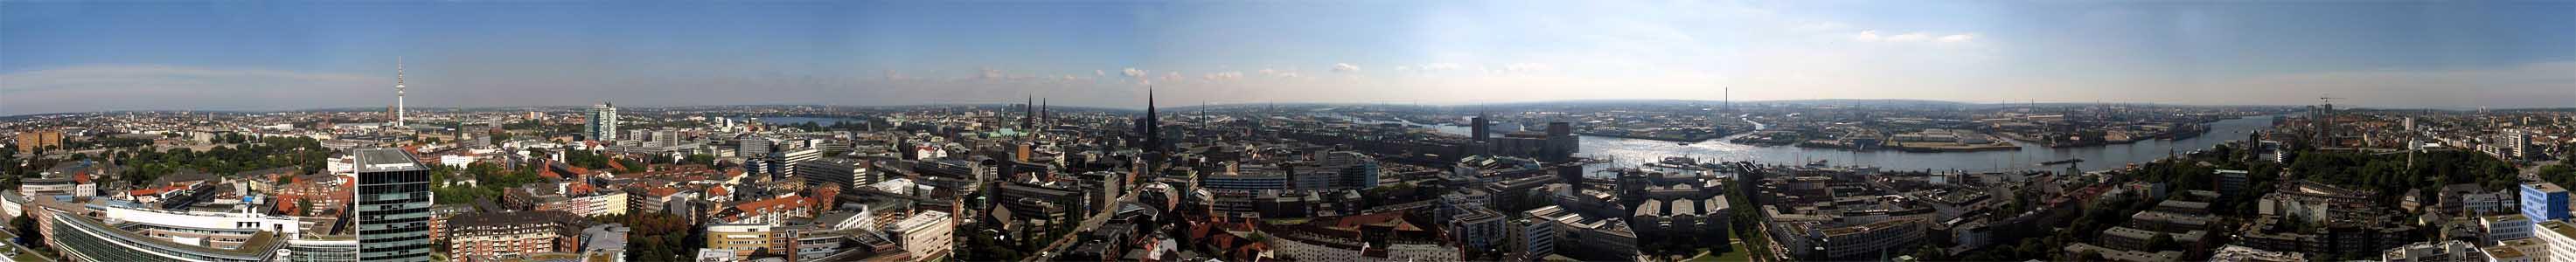 360°-Blick über Hamburg